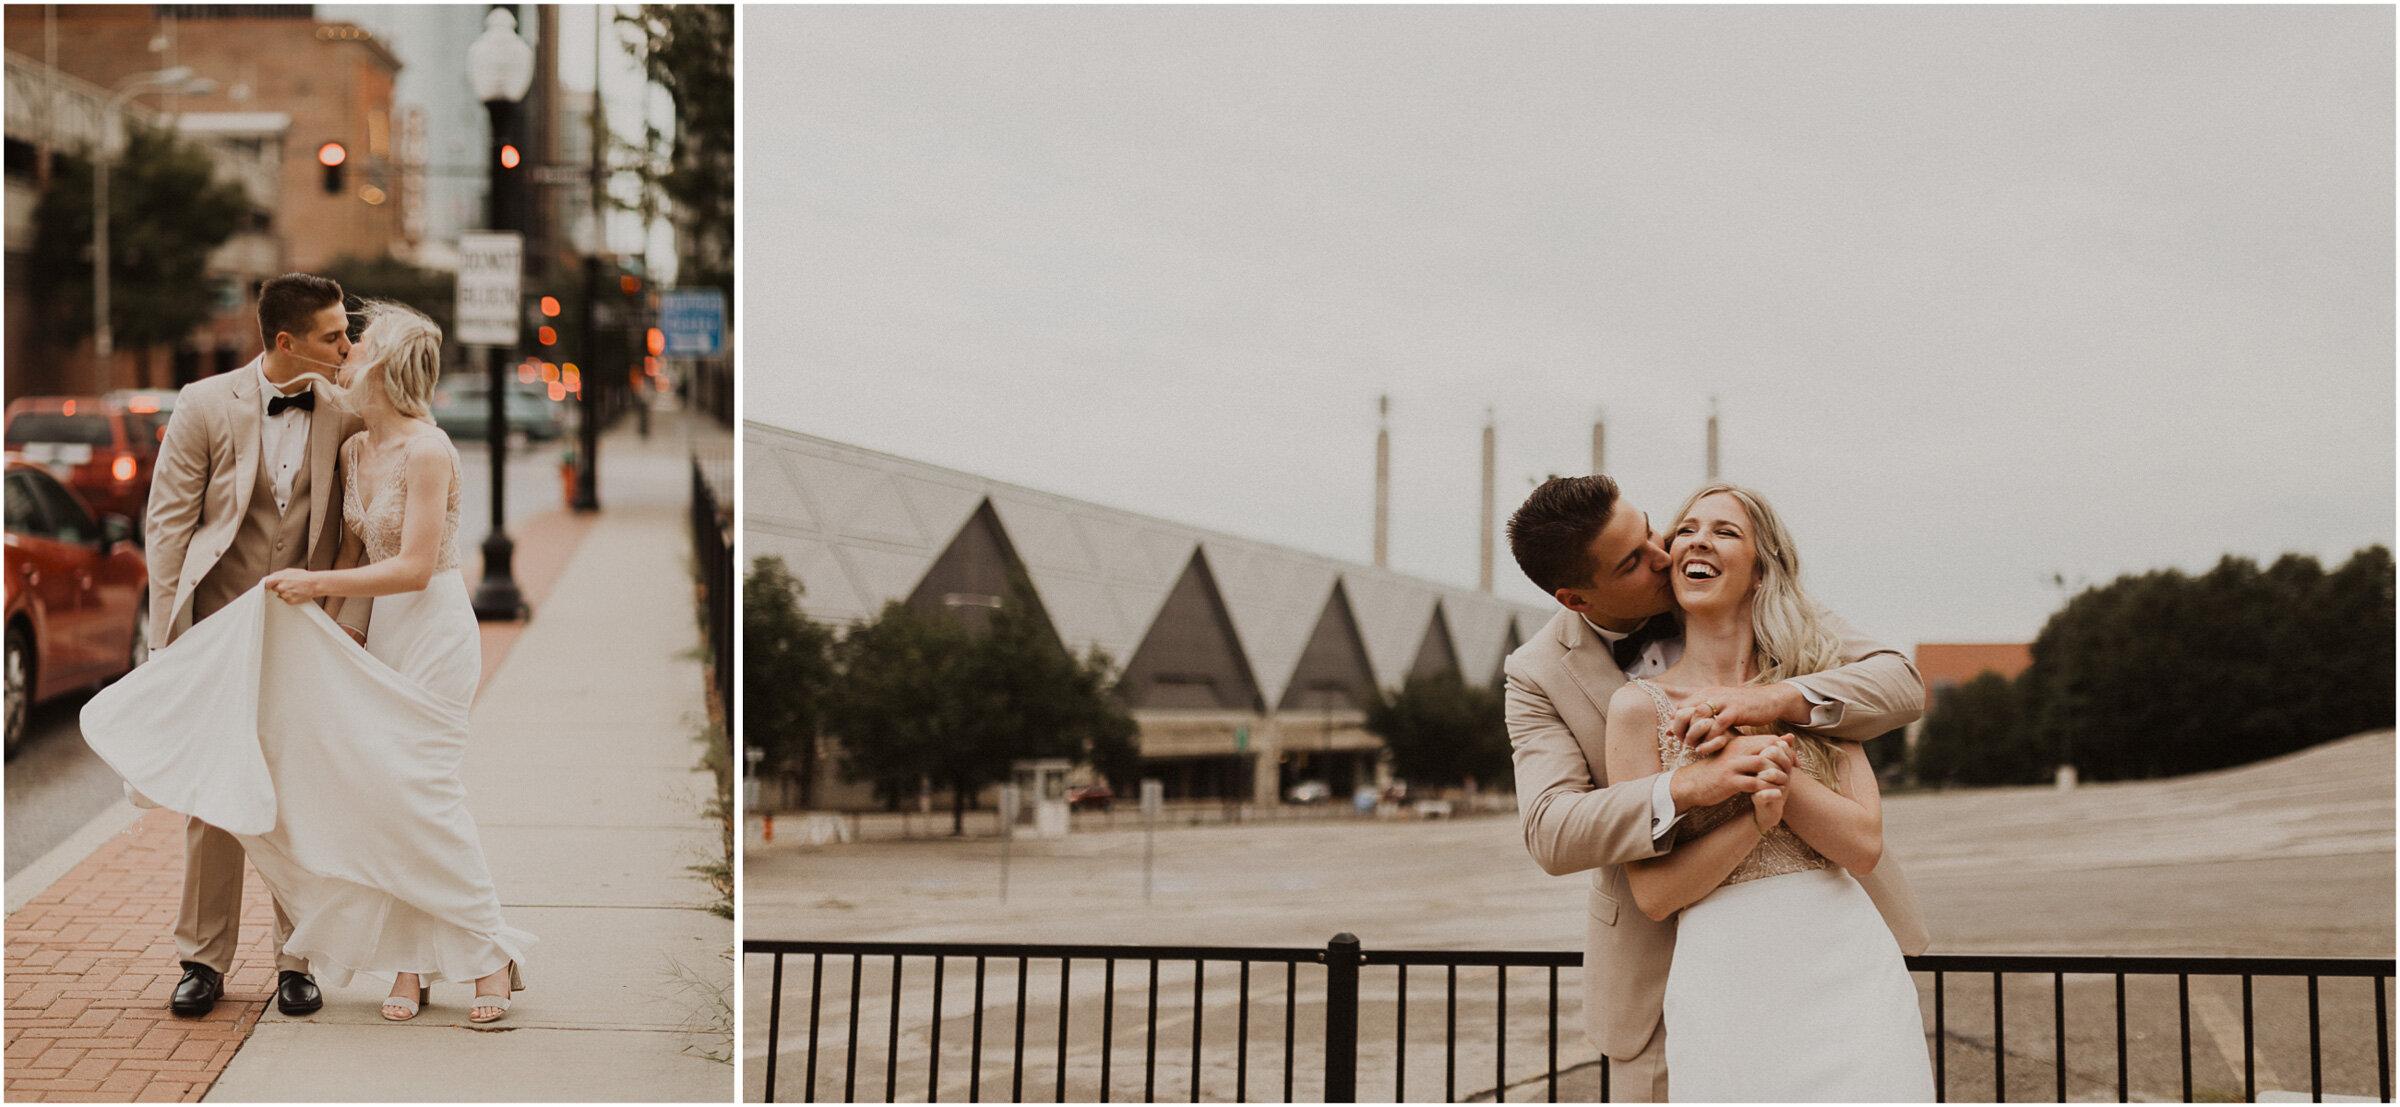 alyssa barletter photography downtown kansas city wedding boulevard brewery reception rainy day wedding-39.jpg